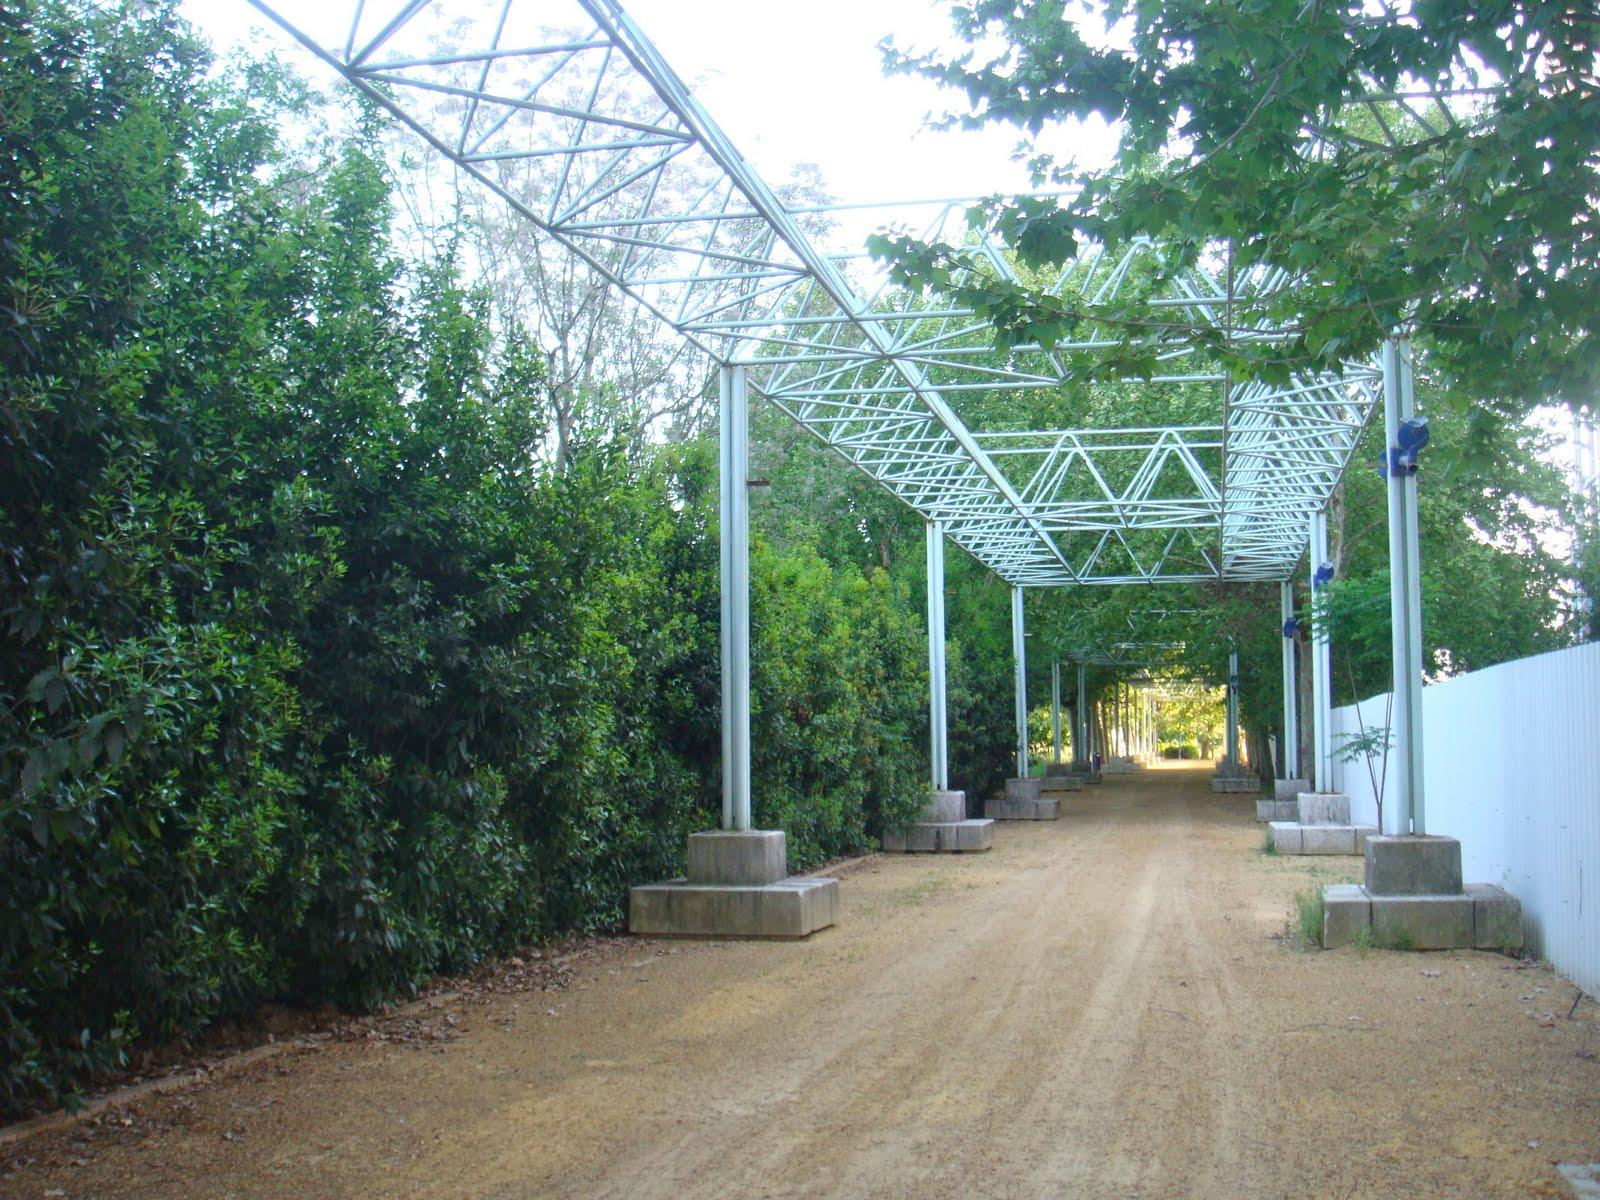 Sevilla contempor nea reapertura jardines del guadalquvir for Jardines del eden sevilla